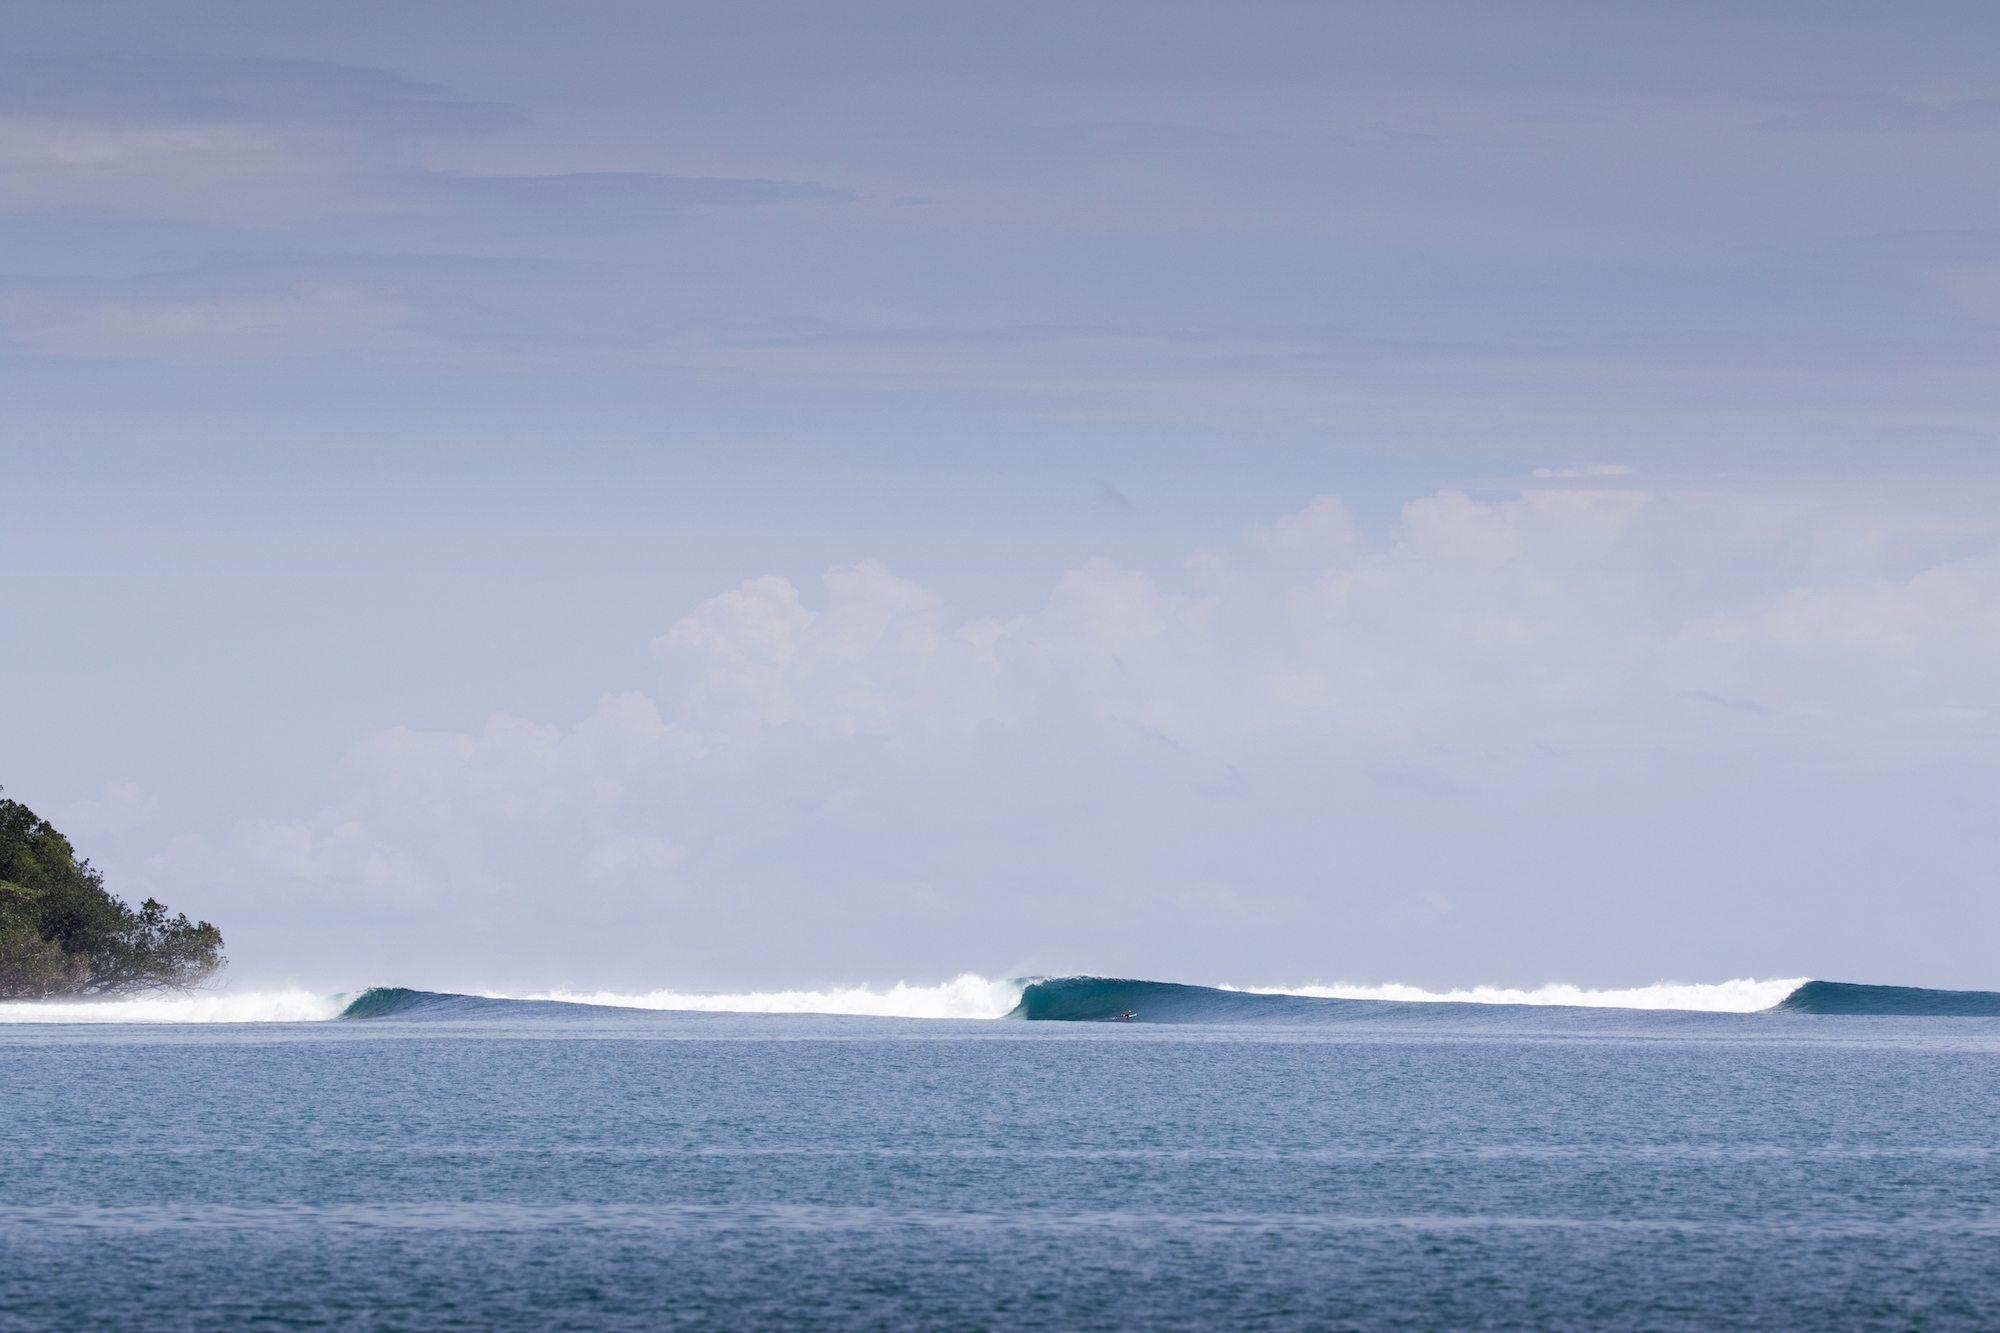 Clarets / Lolok Point / Bay of Plenty Lefts 8